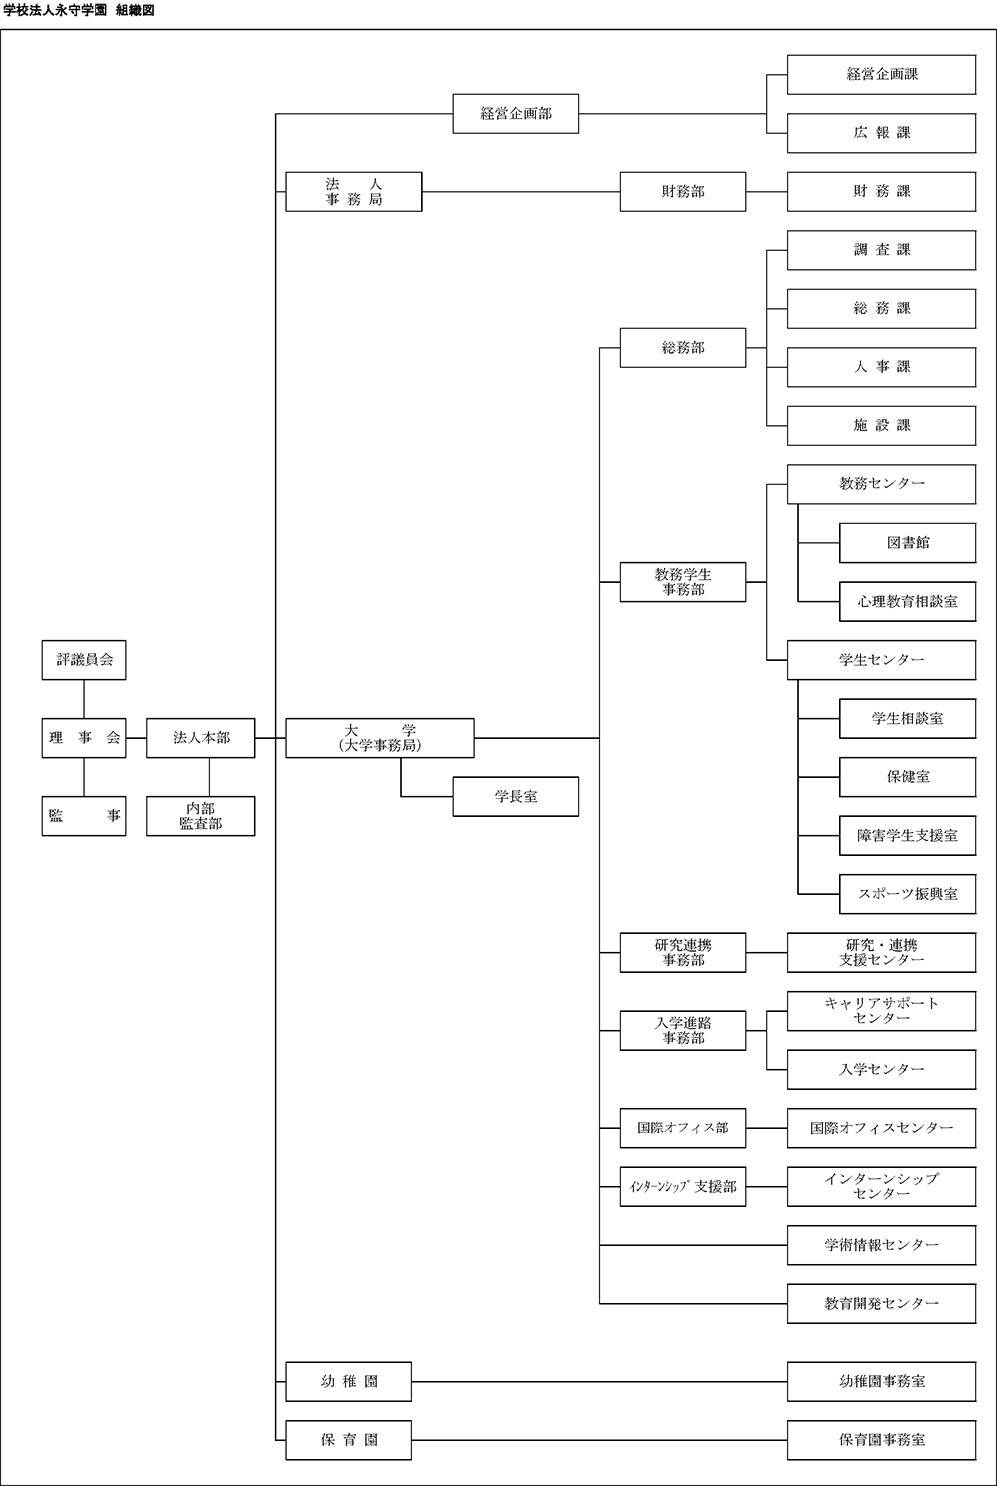 20201001_organization.png